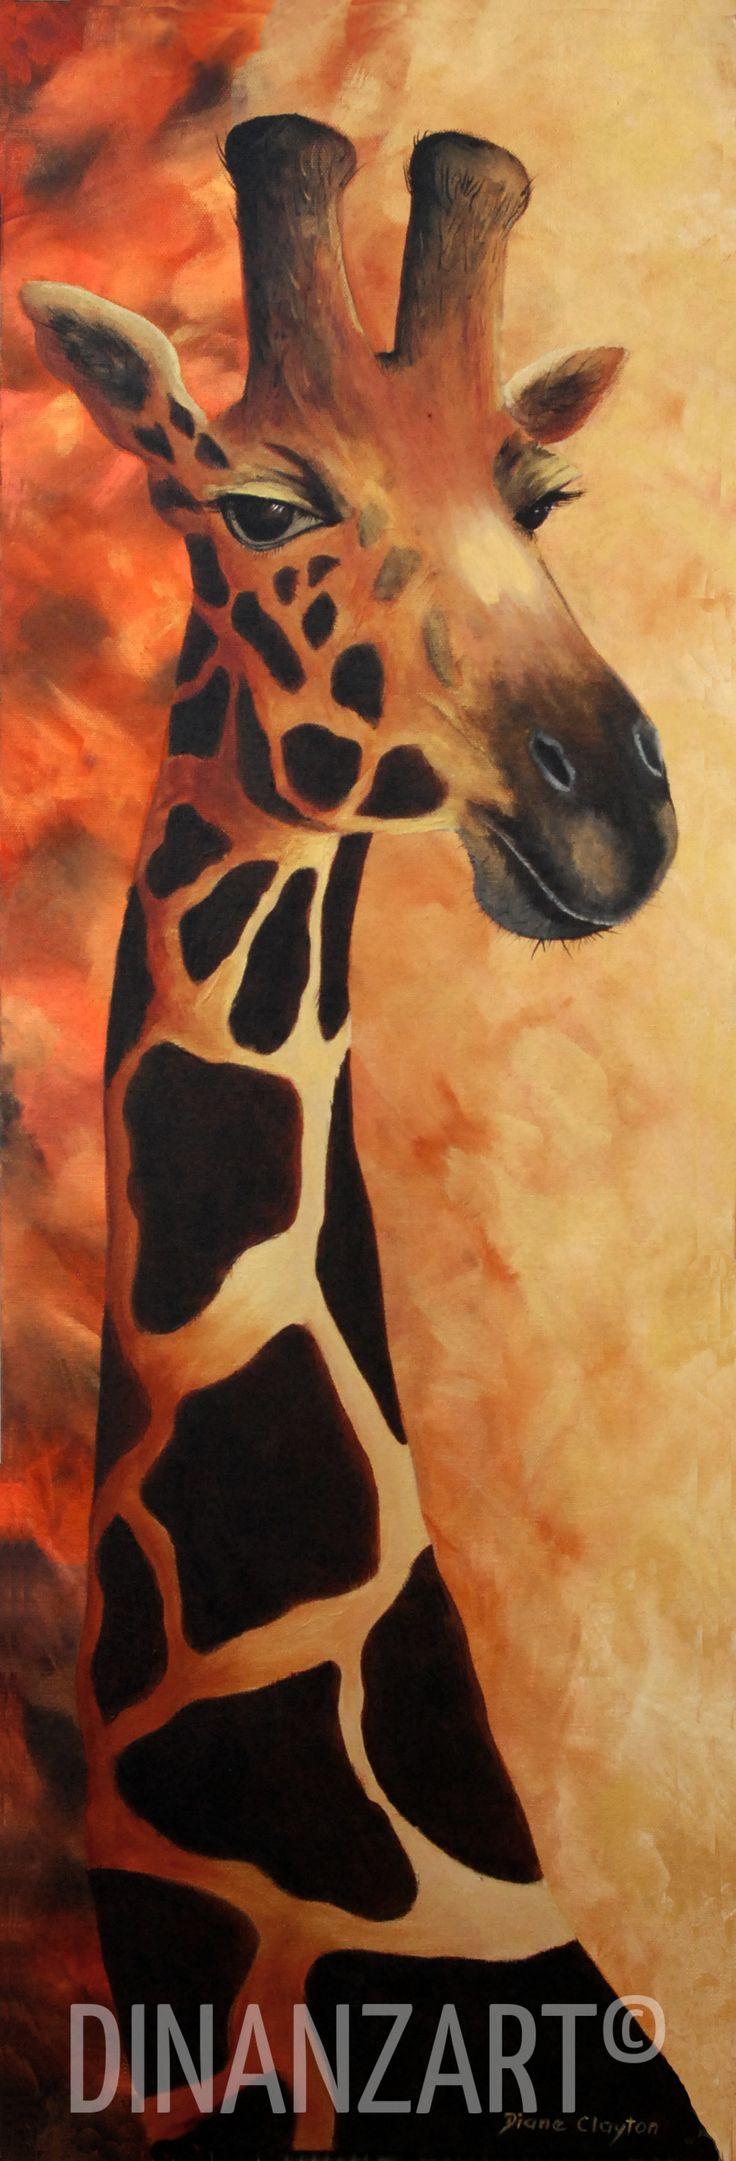 #Giraffe #Metaliic #Art #Artist #dianeclayton